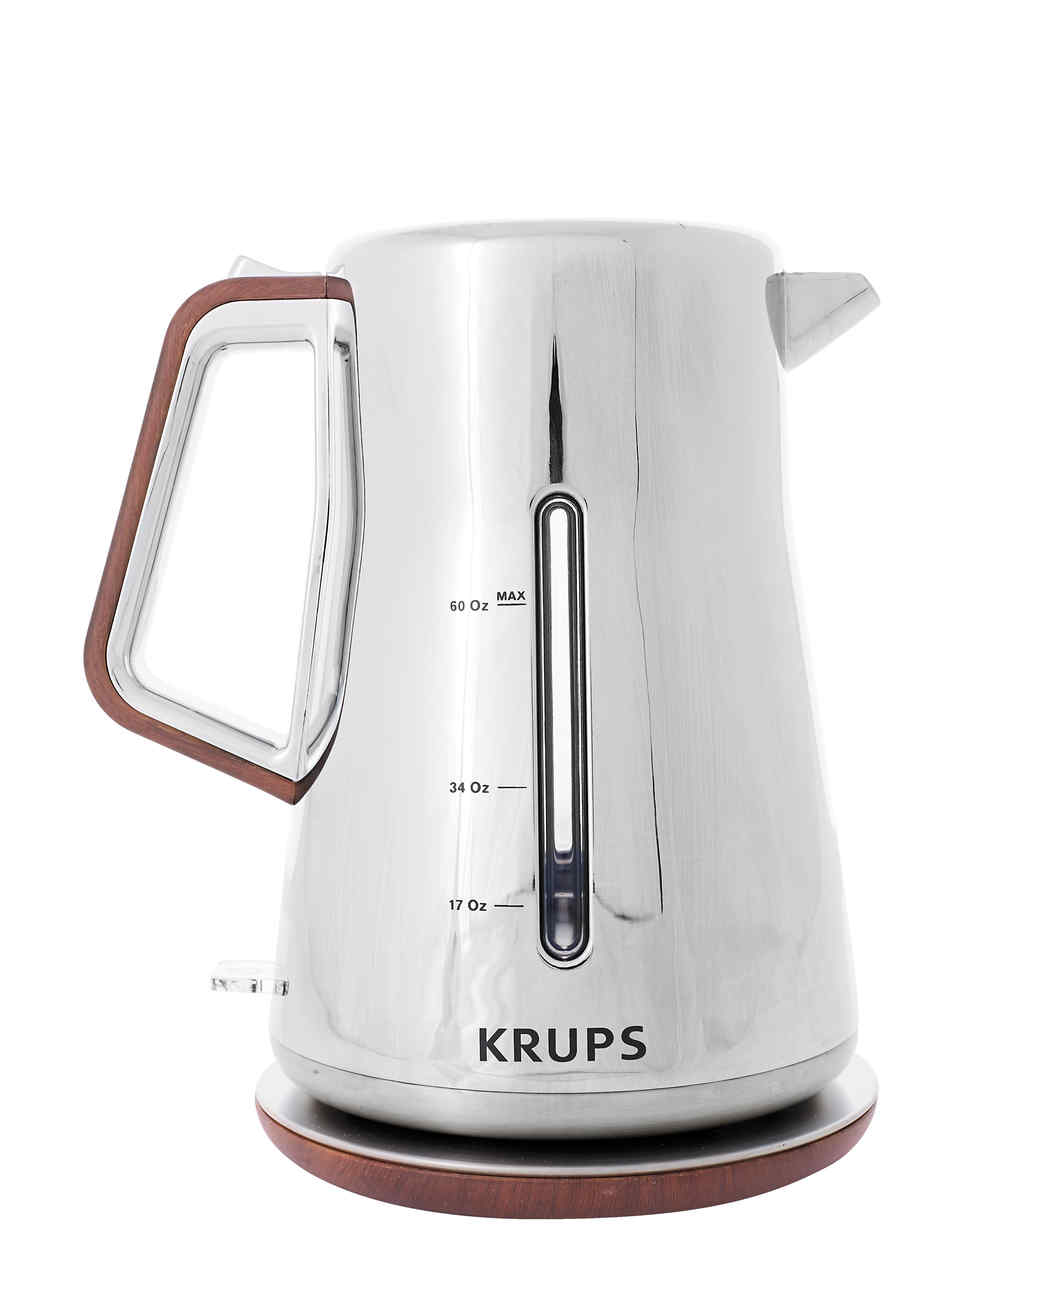 krups-electric-kettle-010-d111219.jpg